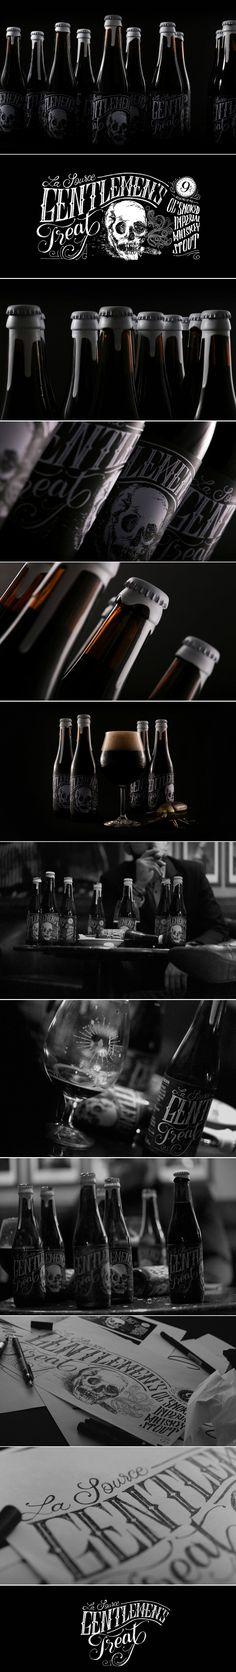 Gentlemen's Treat is a Spooky Stout — The Dieline | Packaging & Branding Design & Innovation News